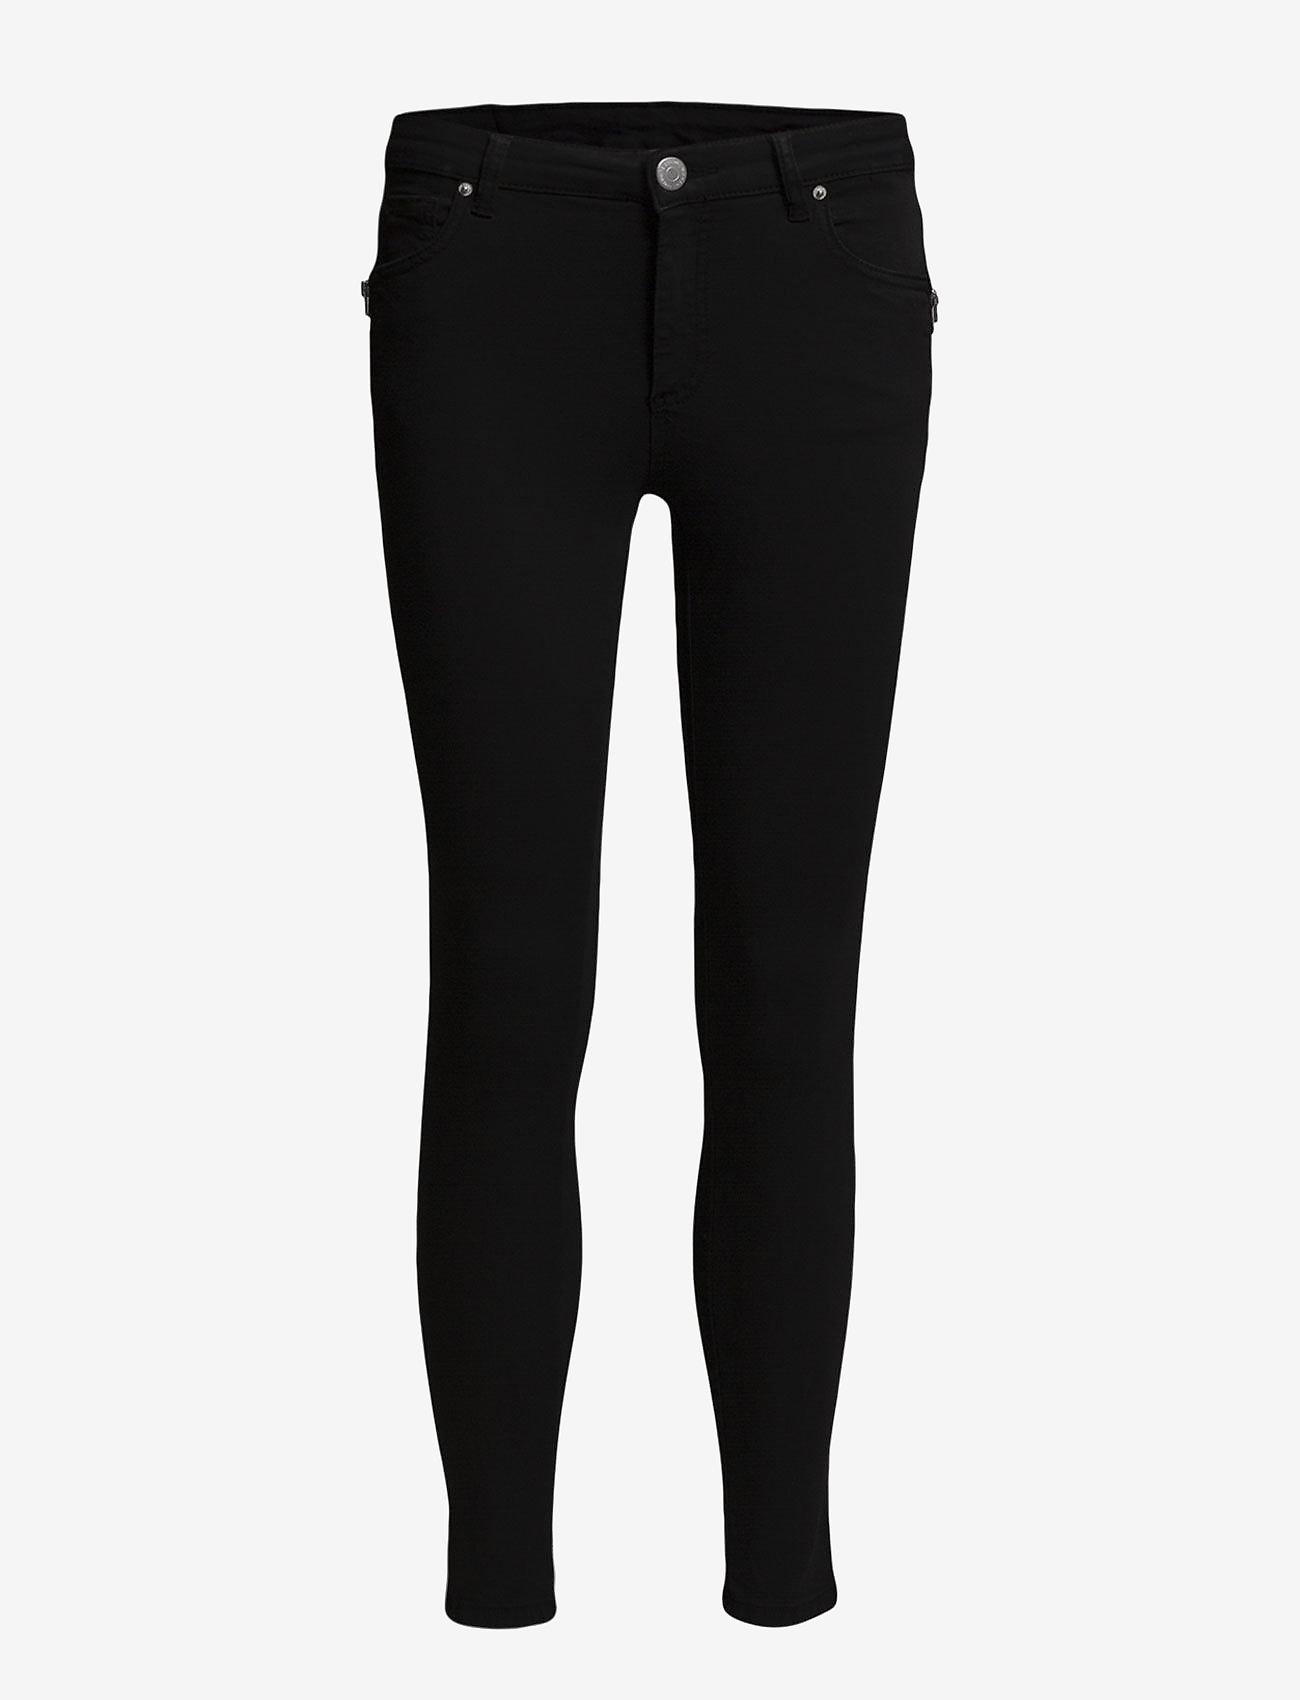 FIVEUNITS - Penelope 266 Zip, Black Line, Jeans - skinny farkut - black line - 1